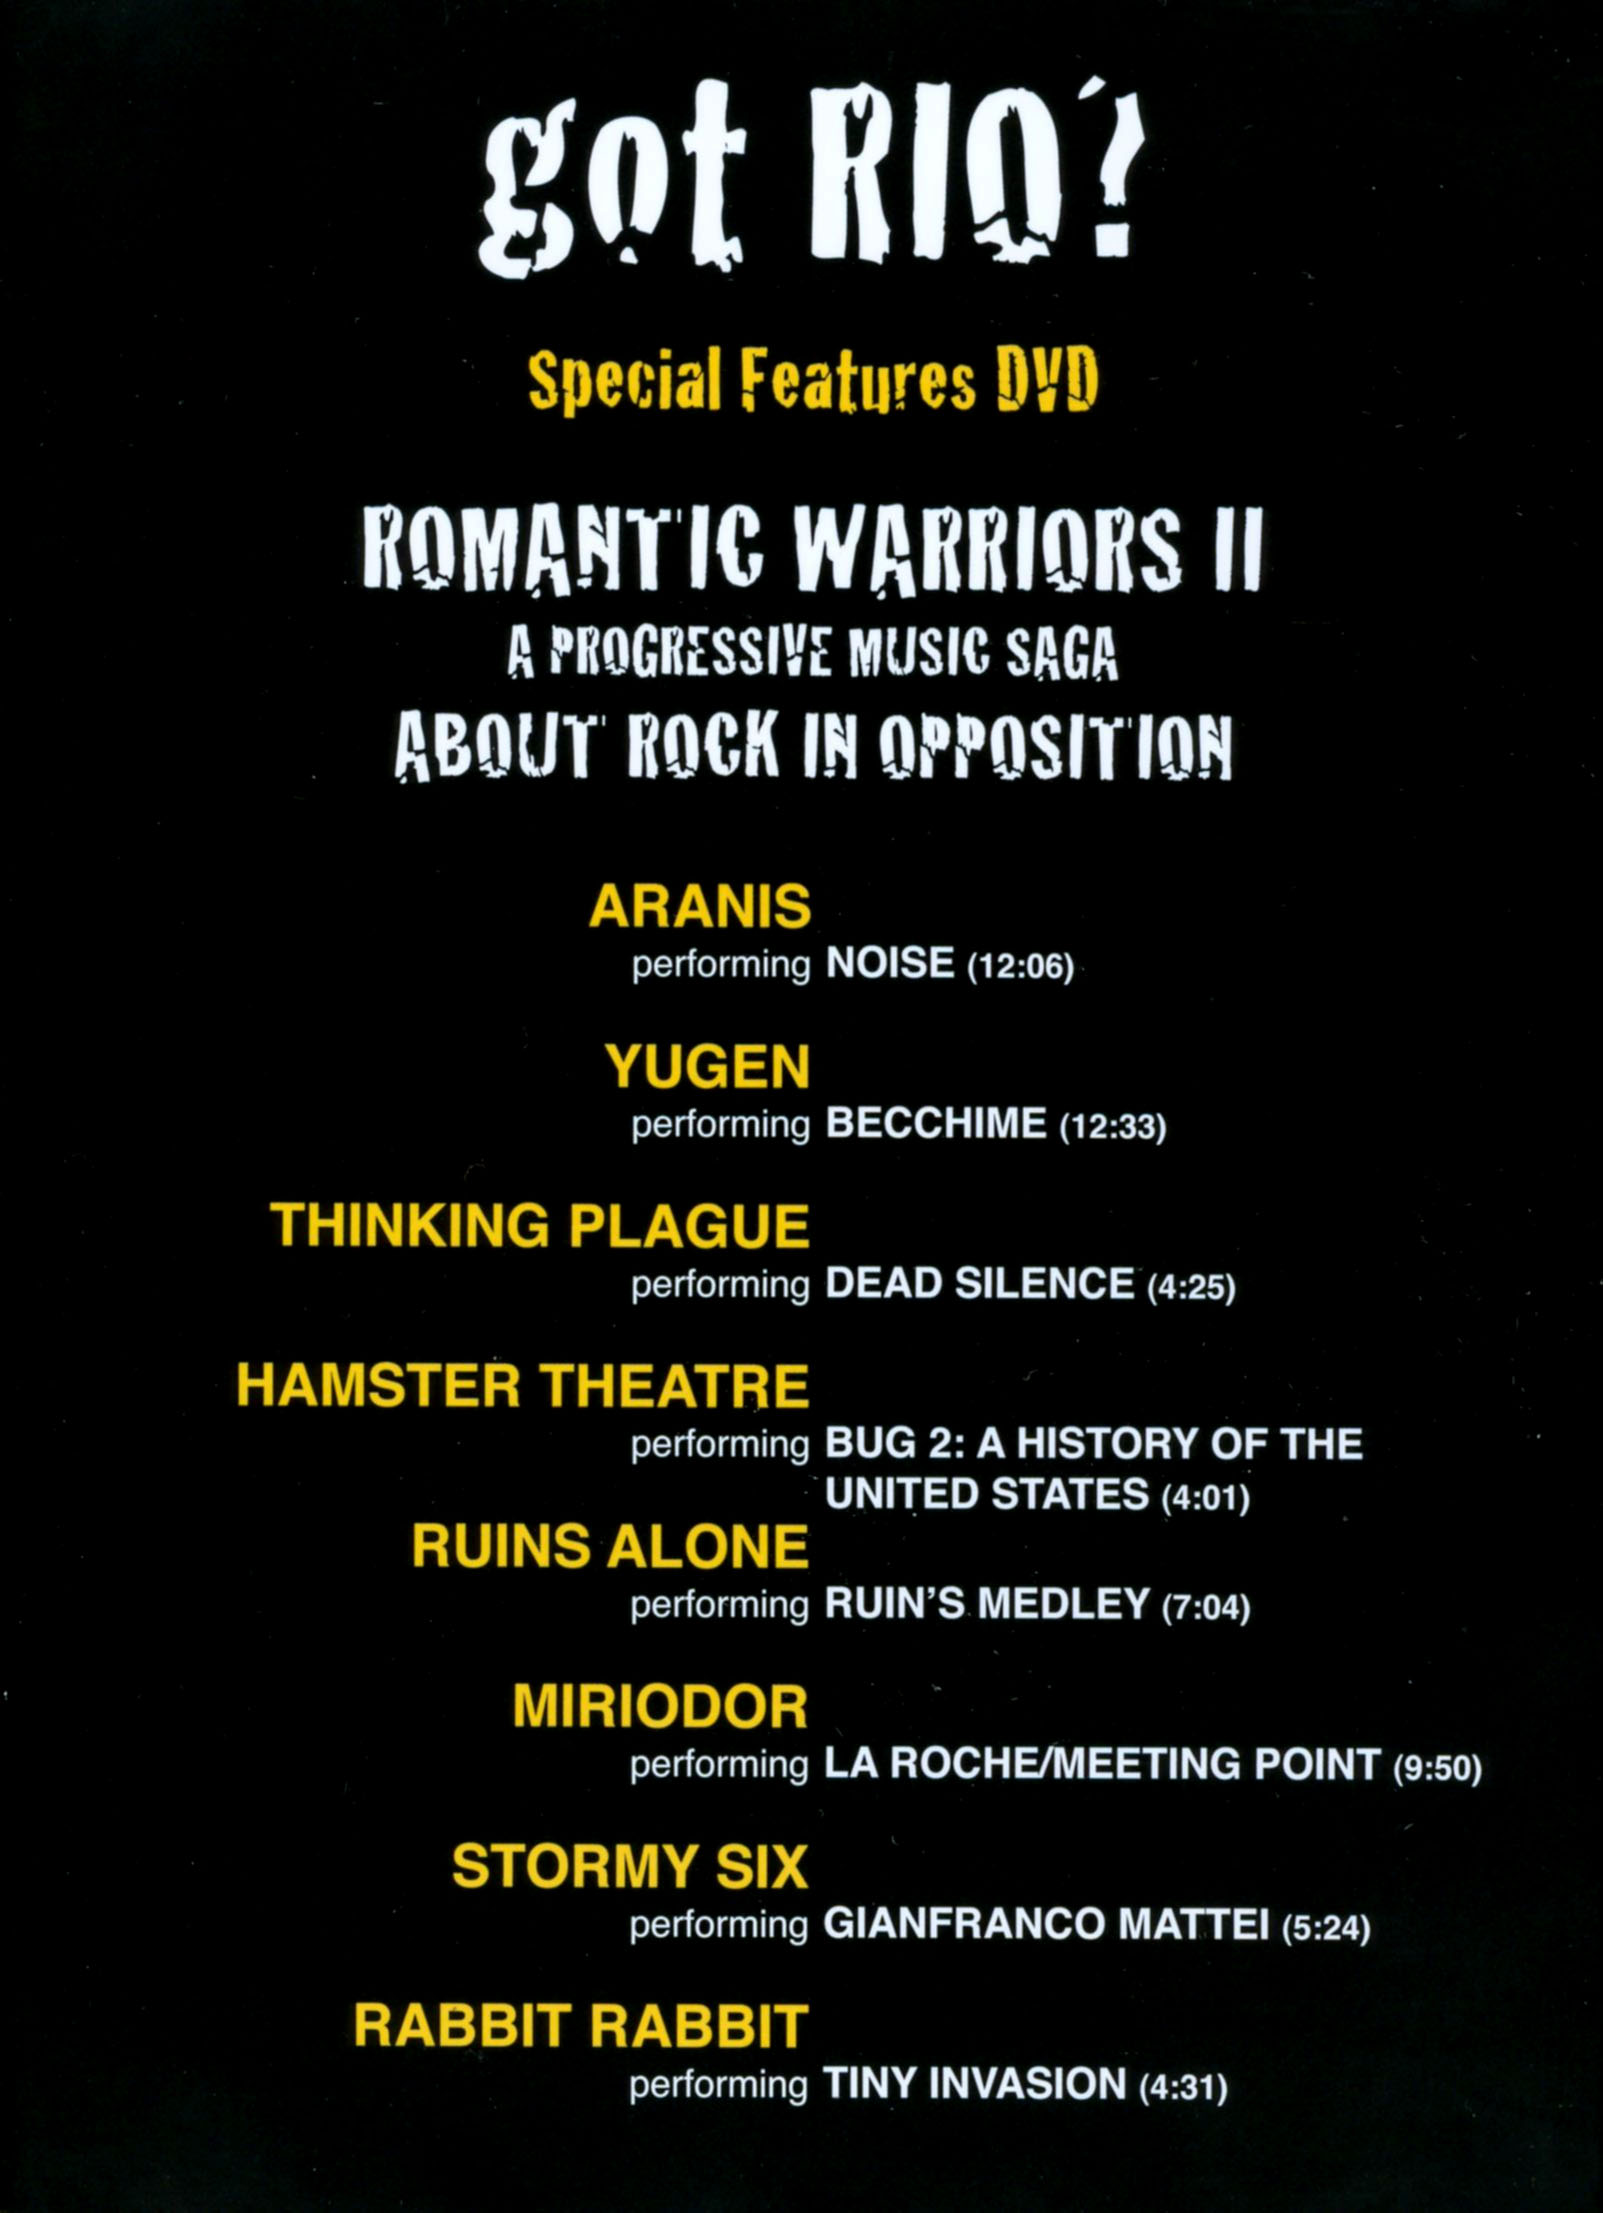 Got Rio?: Special Features - Romantic Warriors II